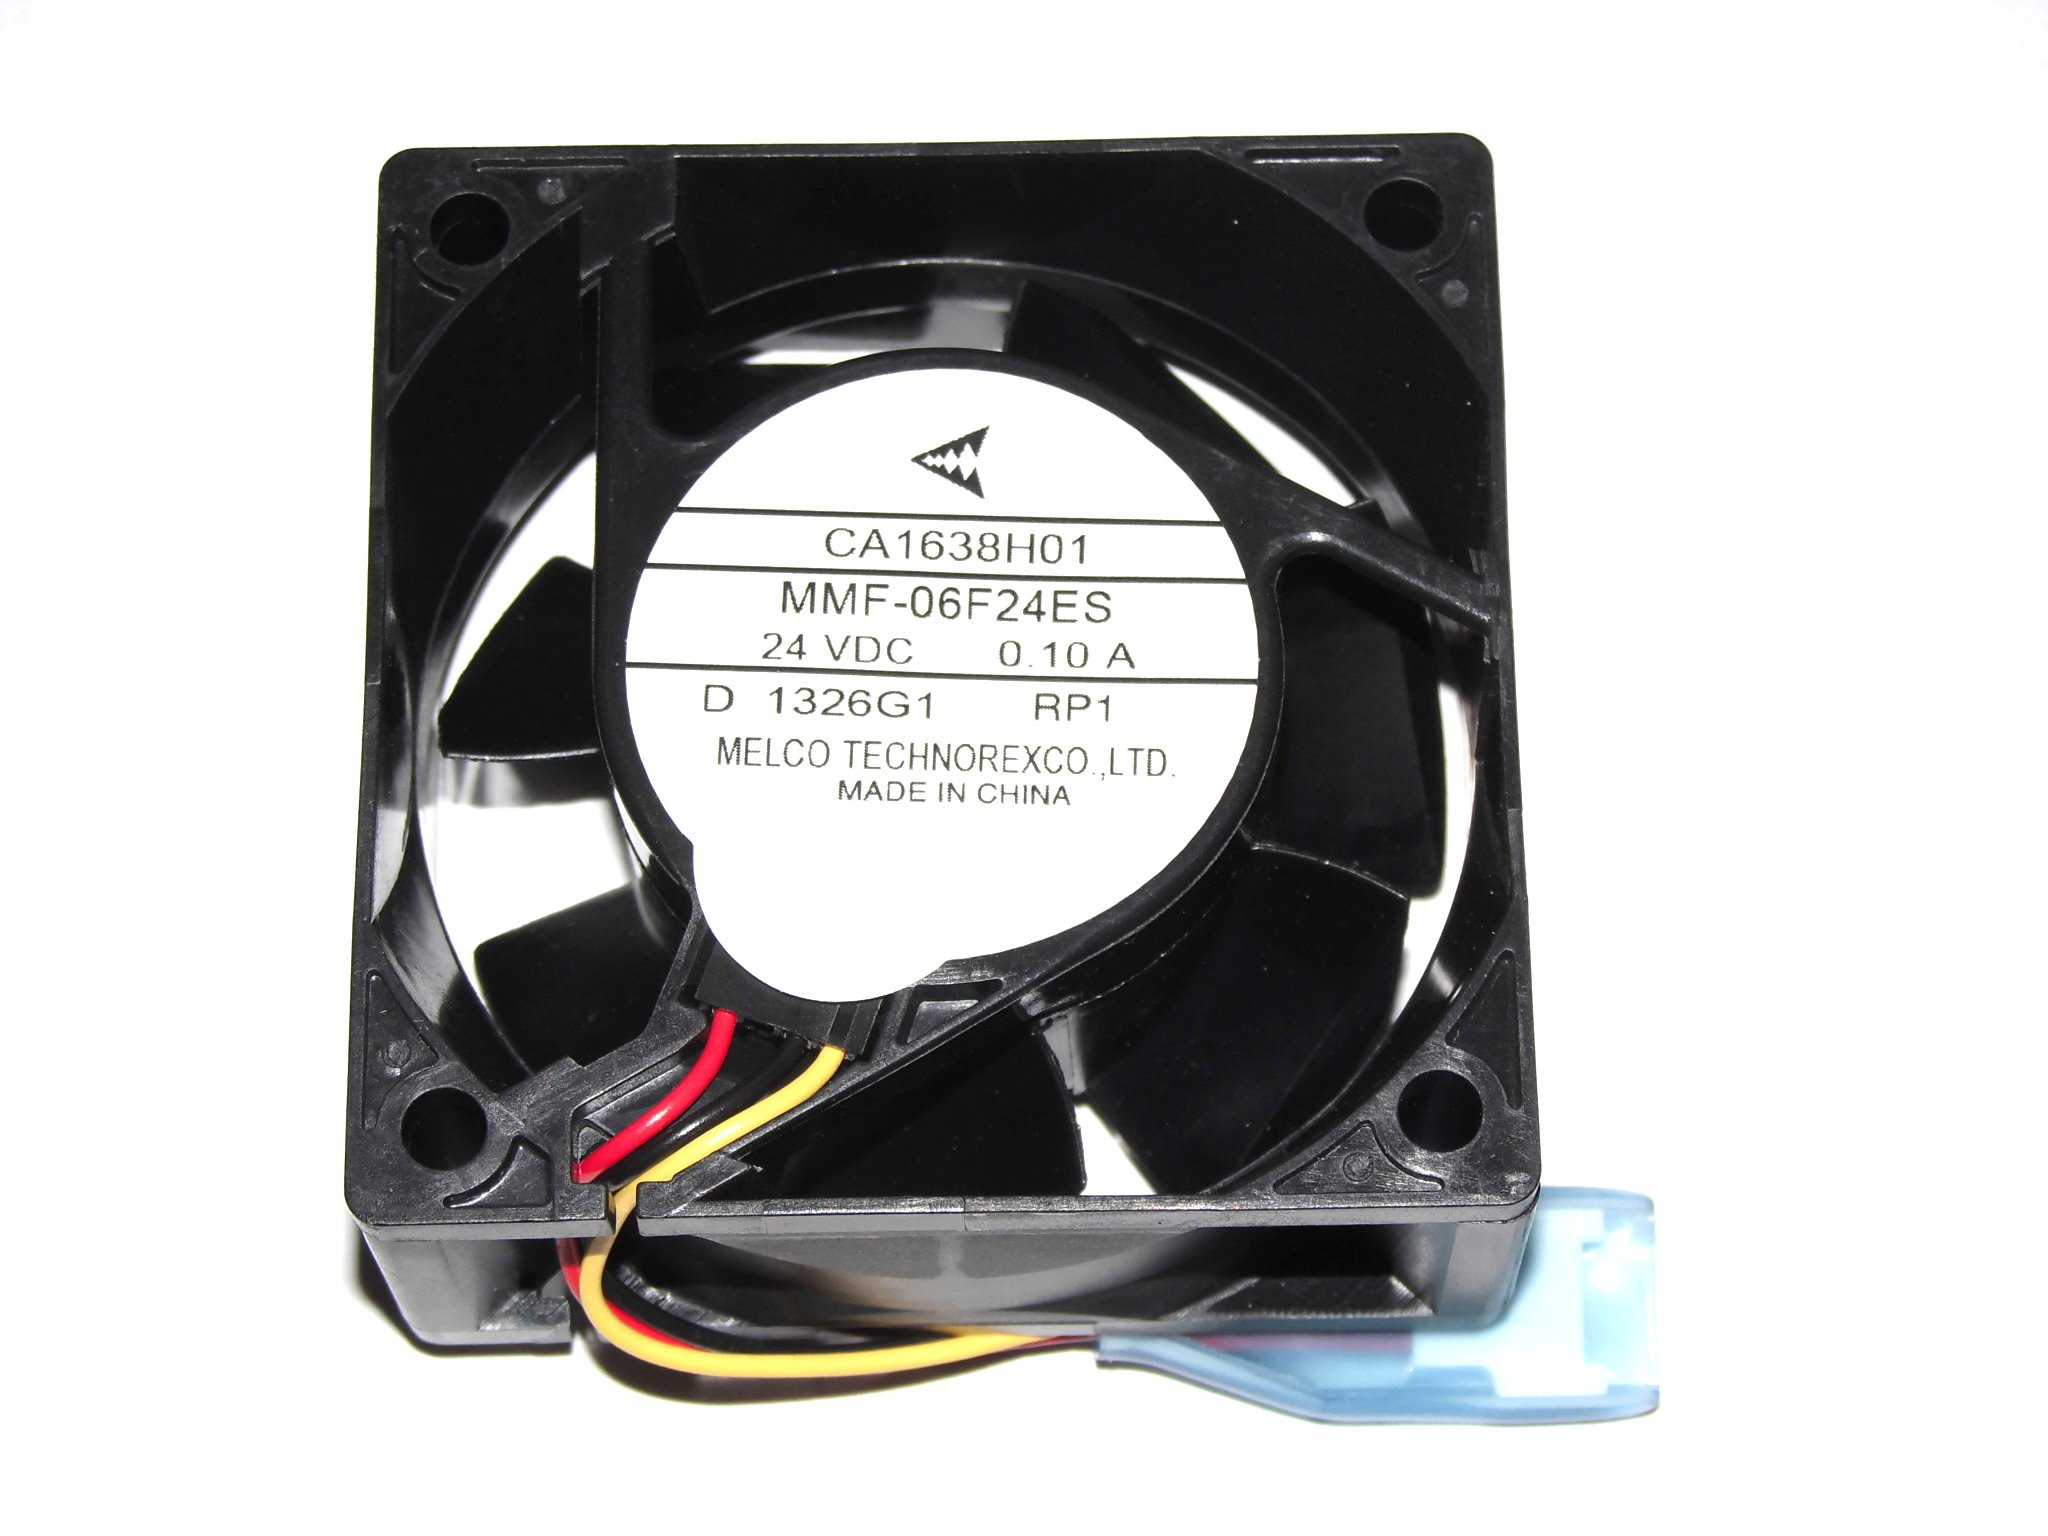 MITSUBISHI 60mm MMF-06F24ES RP1 24V 0.1A 3Wire CA1638H01 Cooling Fan